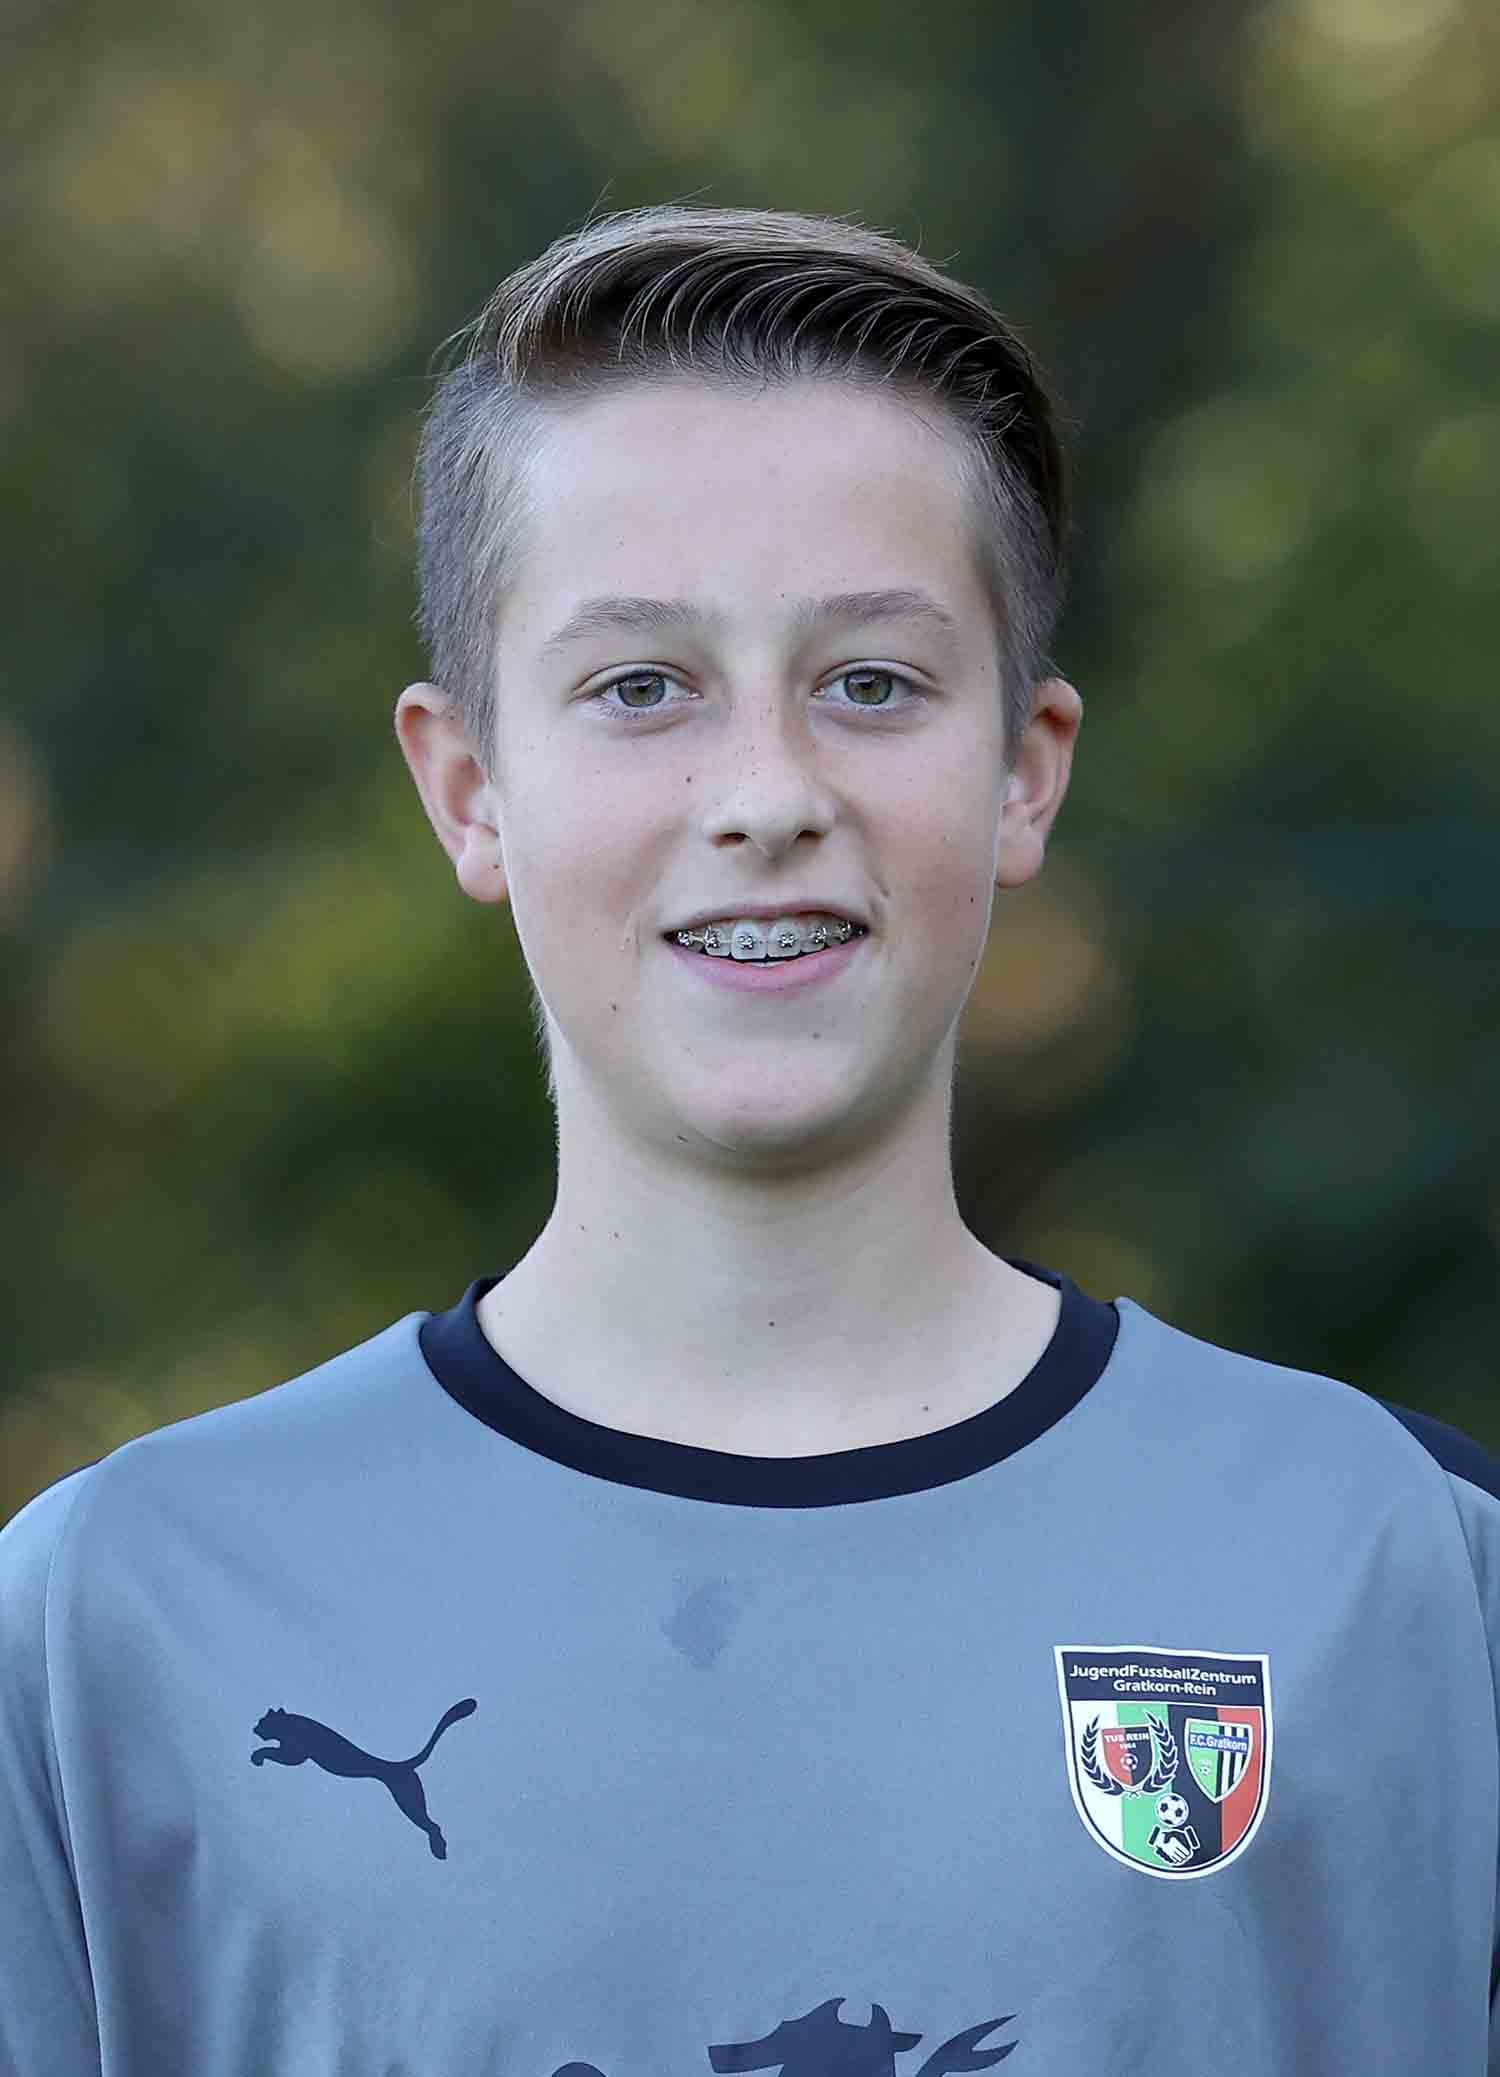 David Rappold, FC Gratkorn U15